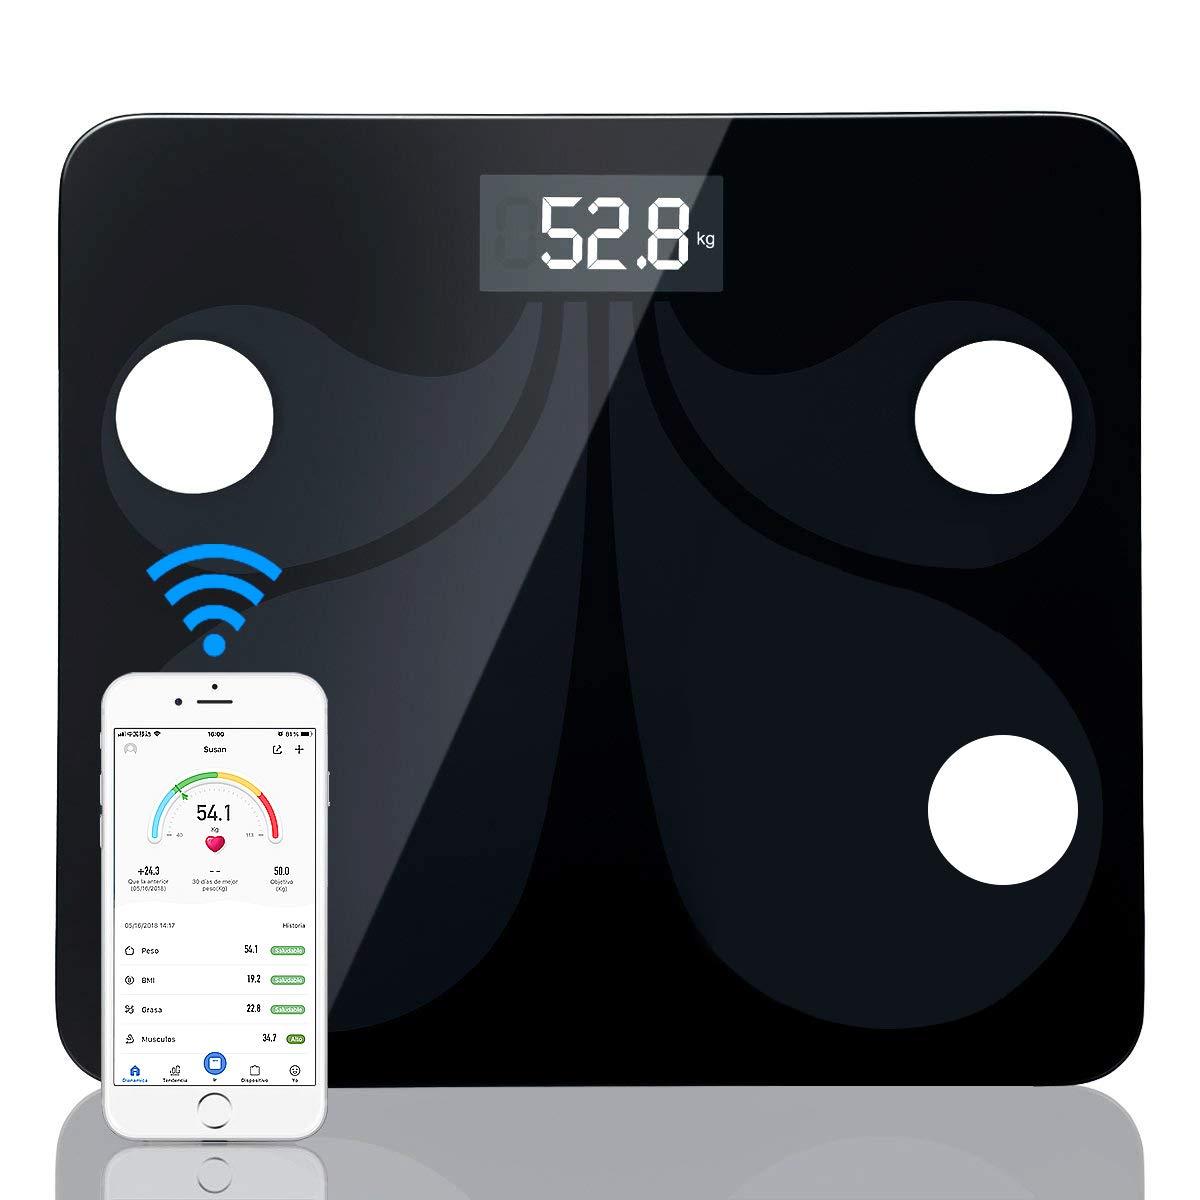 sumuya Báscula de Baño Digital Alta Medición Precisa180 kg/400 lbs, Balanza Digital Baño, Báscula Electrónica, Medidora Composición Bluetooth para Móviles ...